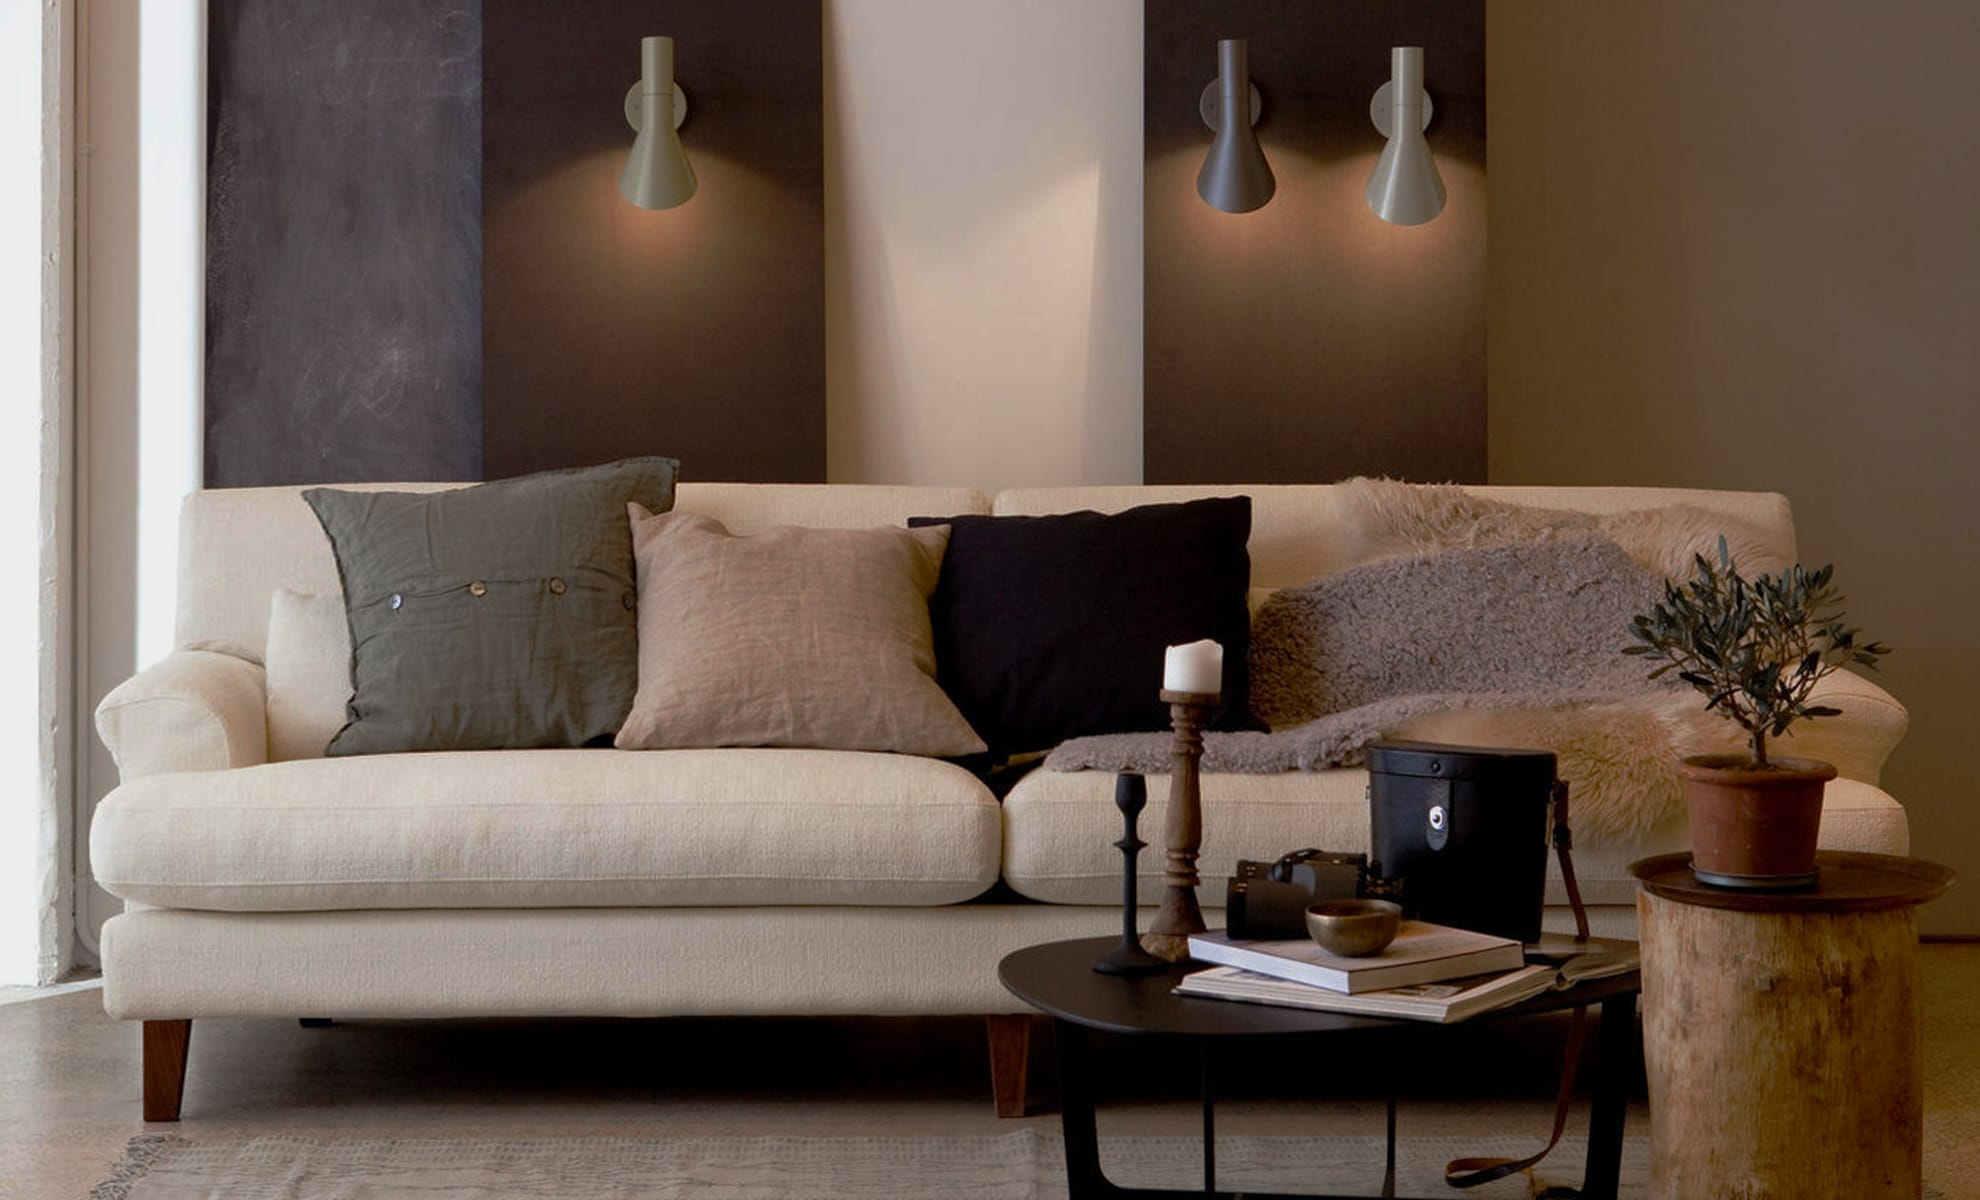 4 Key Pieces to Design a Timeless Home